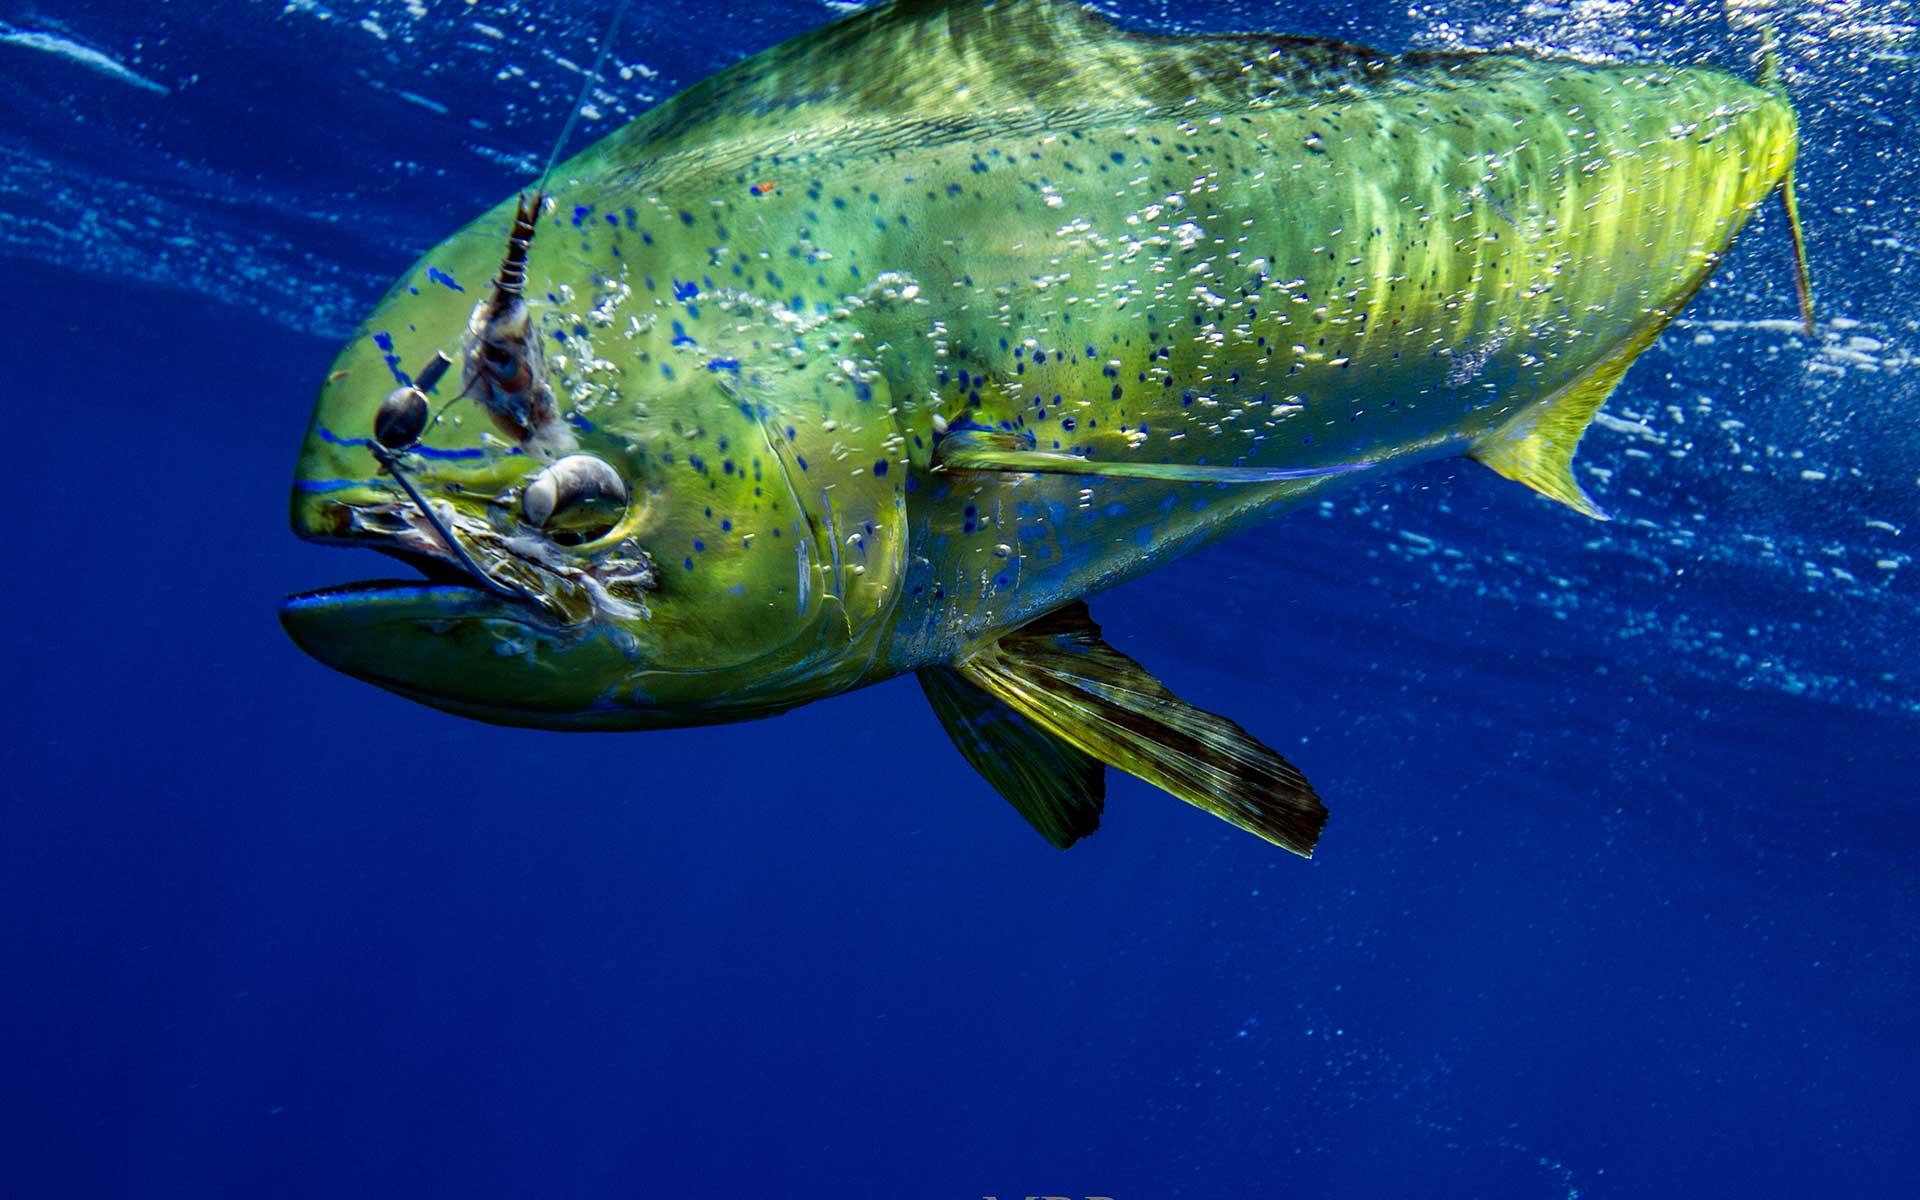 Key west fishing charters key west fishing charters for Best fishing charters in key west